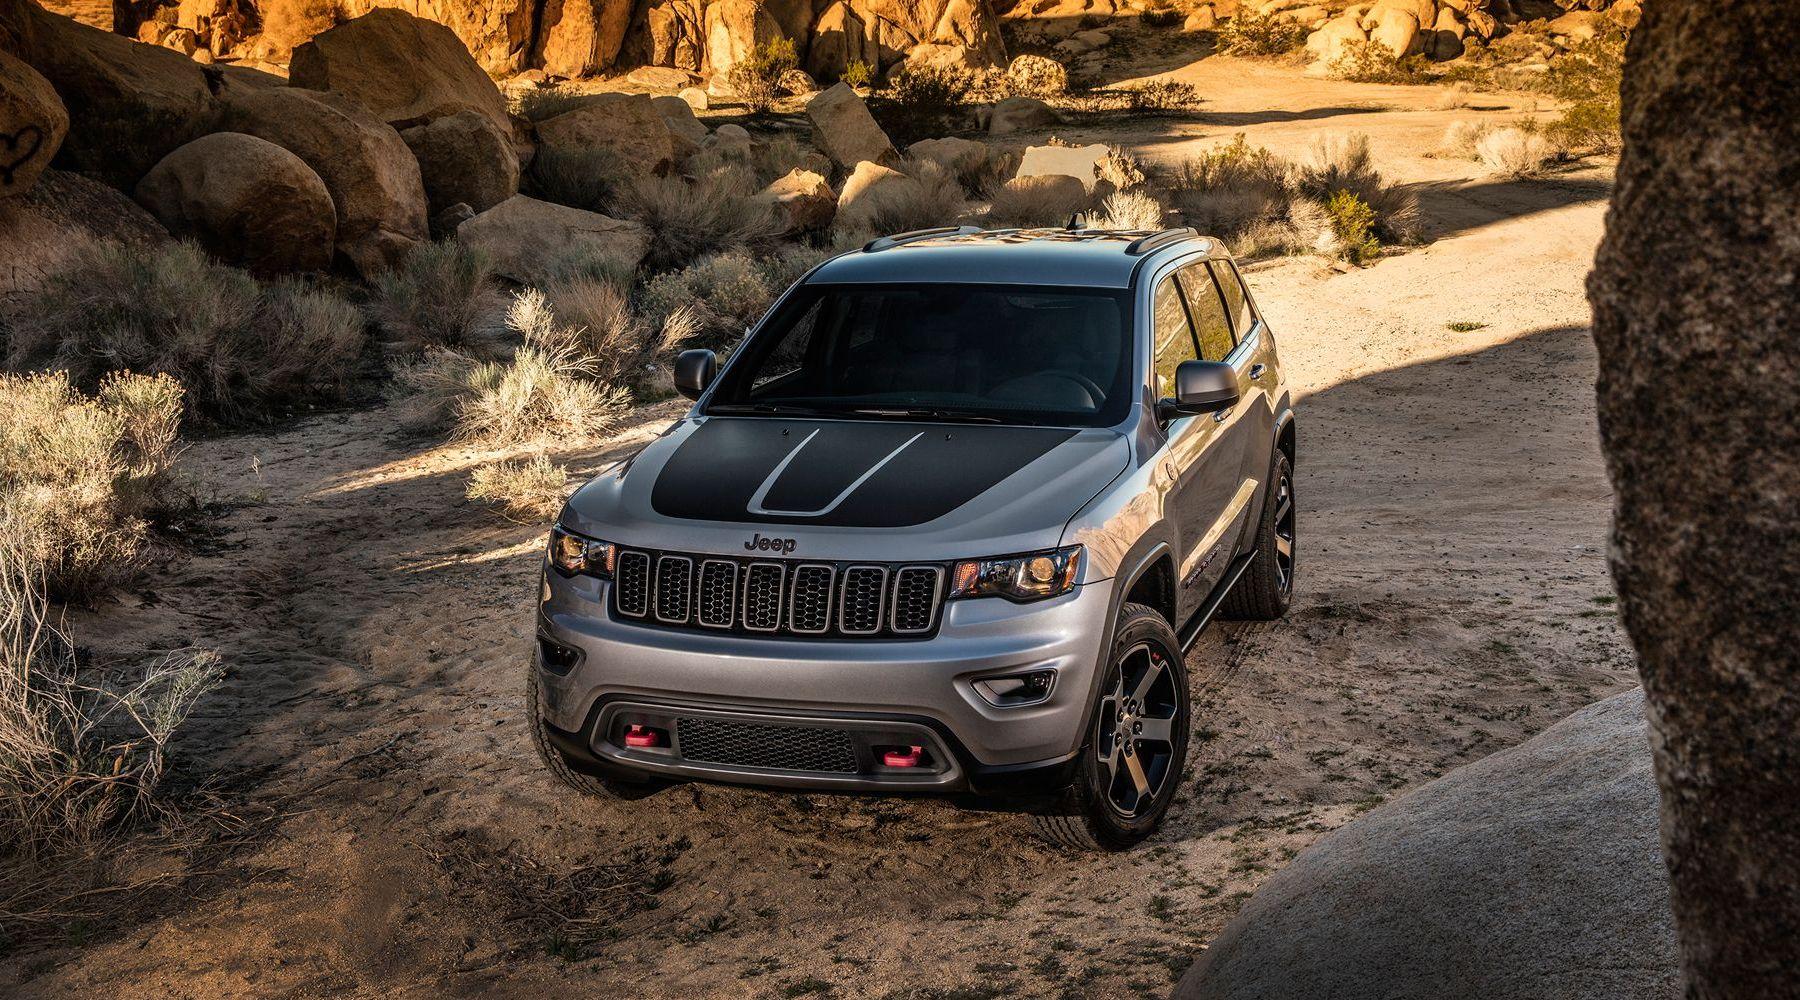 Offroad Jeep Grand Cherokee Trailhawk Http Www Webaraba Com